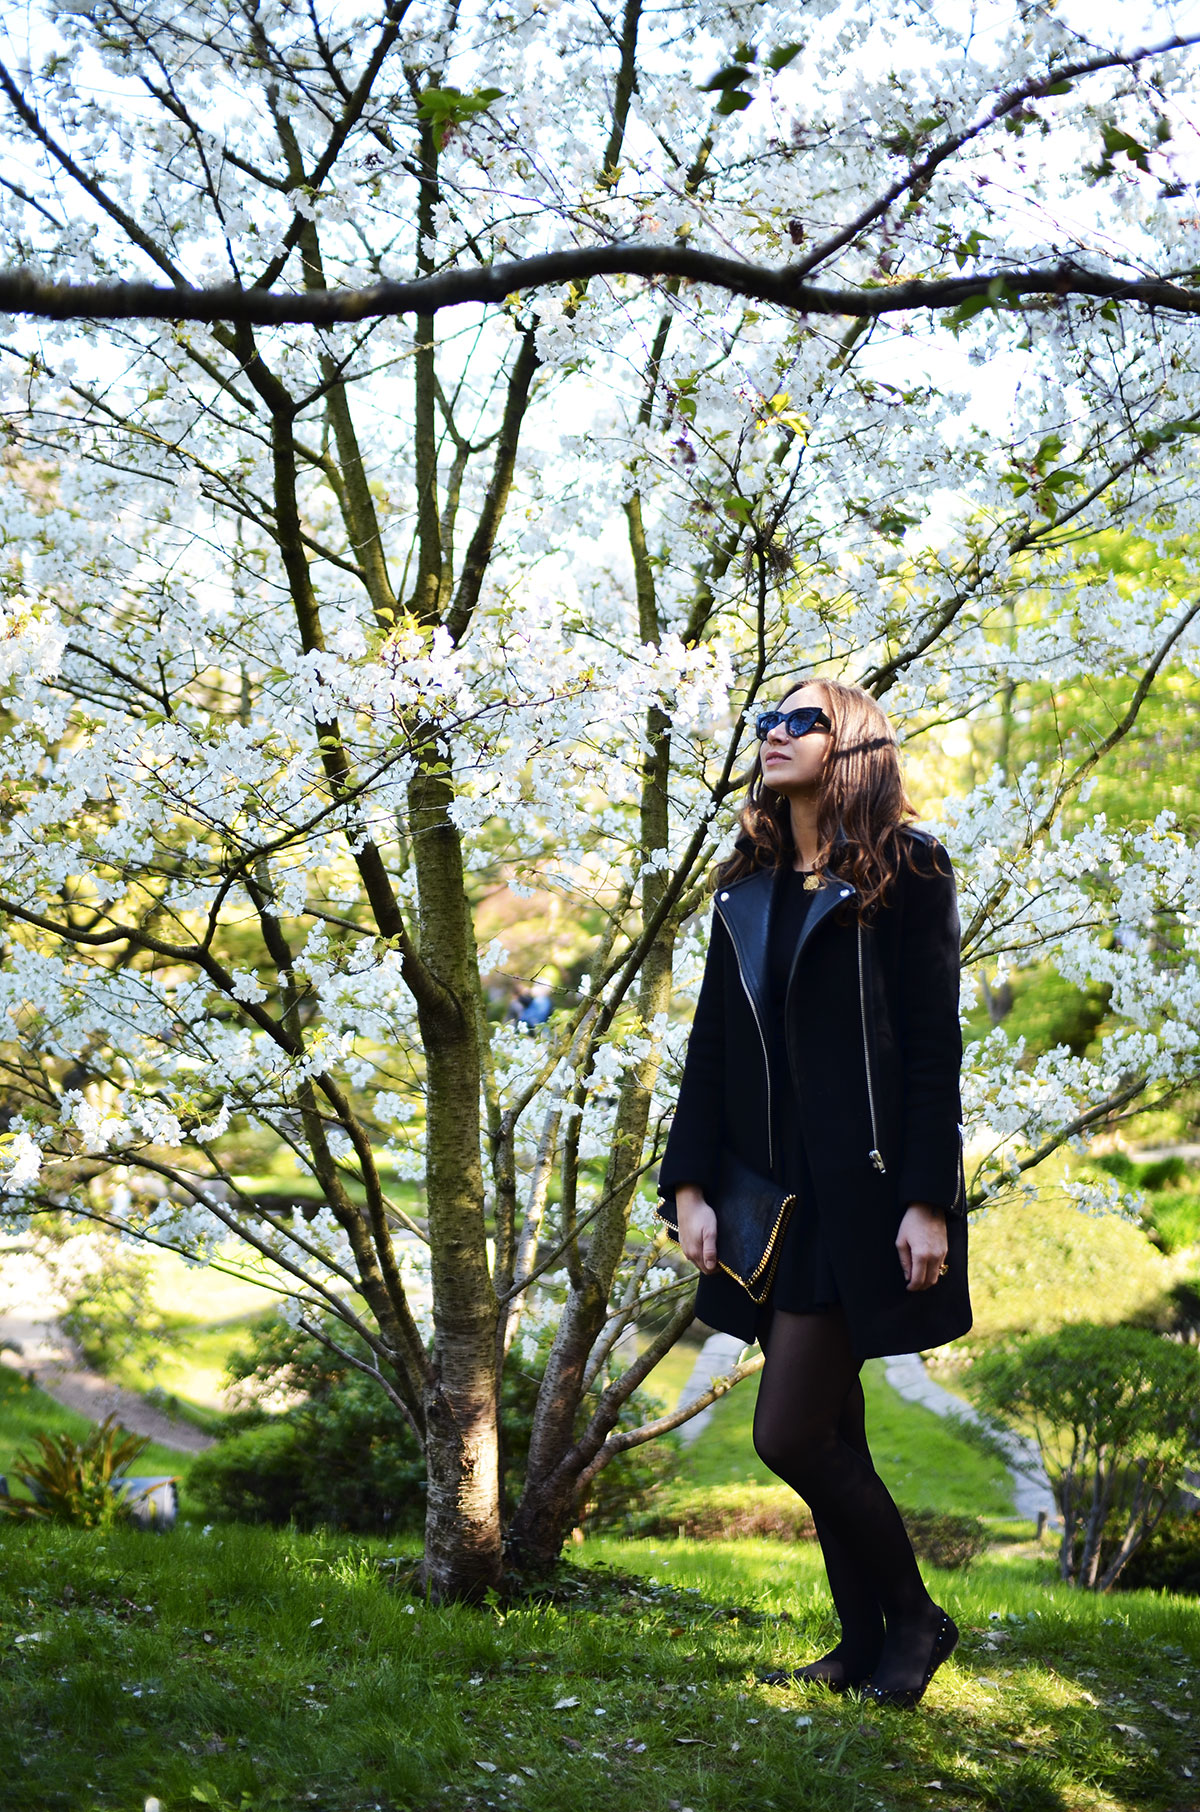 The Wild Parisian jardin japonais